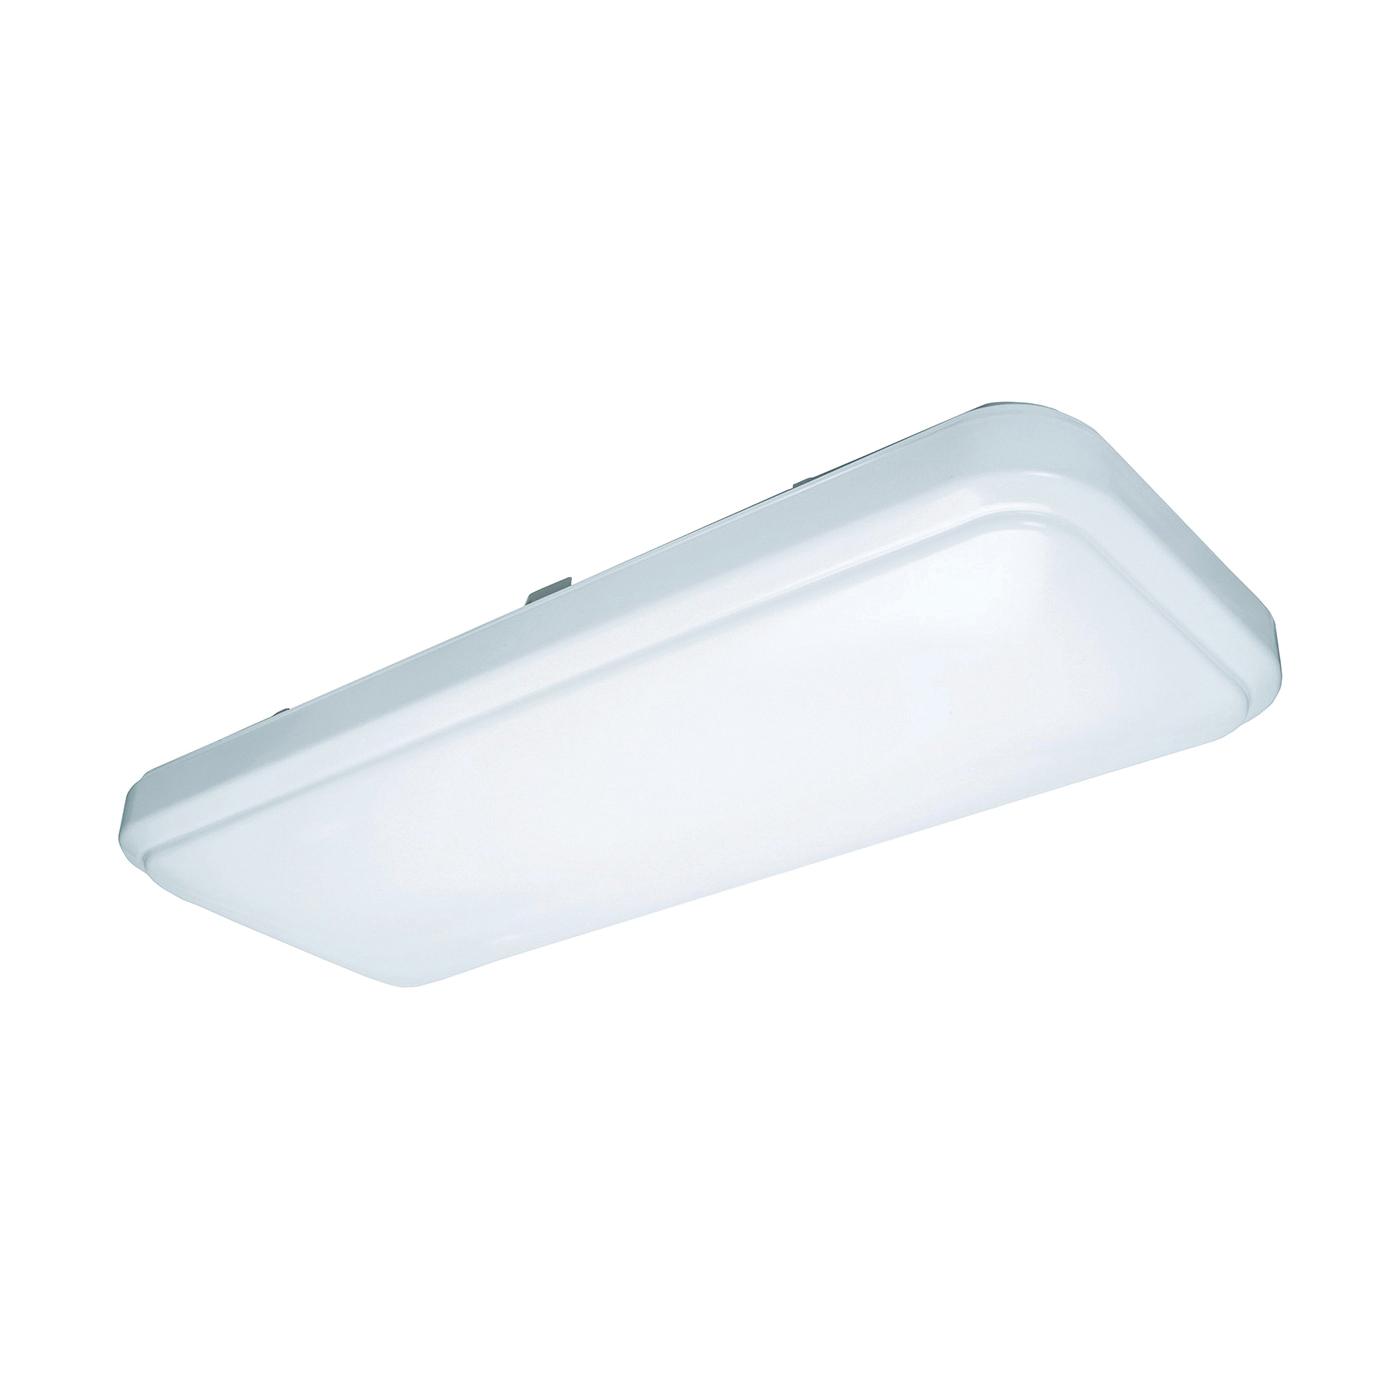 Picture of ETI 54648142 Ceiling Light, 120 VAC, 20 W, LED Lamp, 1500 Lumens, 4000 K Color Temp